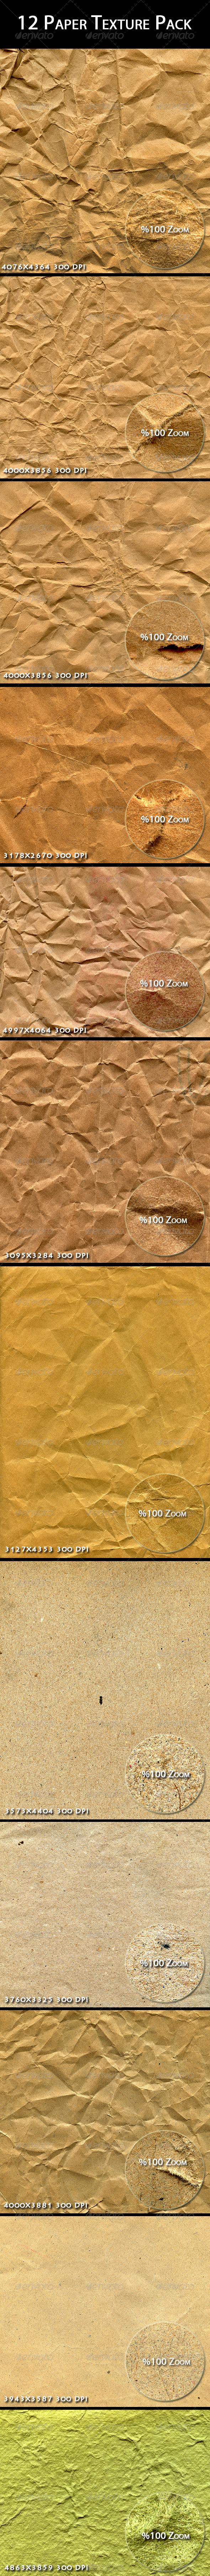 12 Paper Texture Pack - Paper Textures